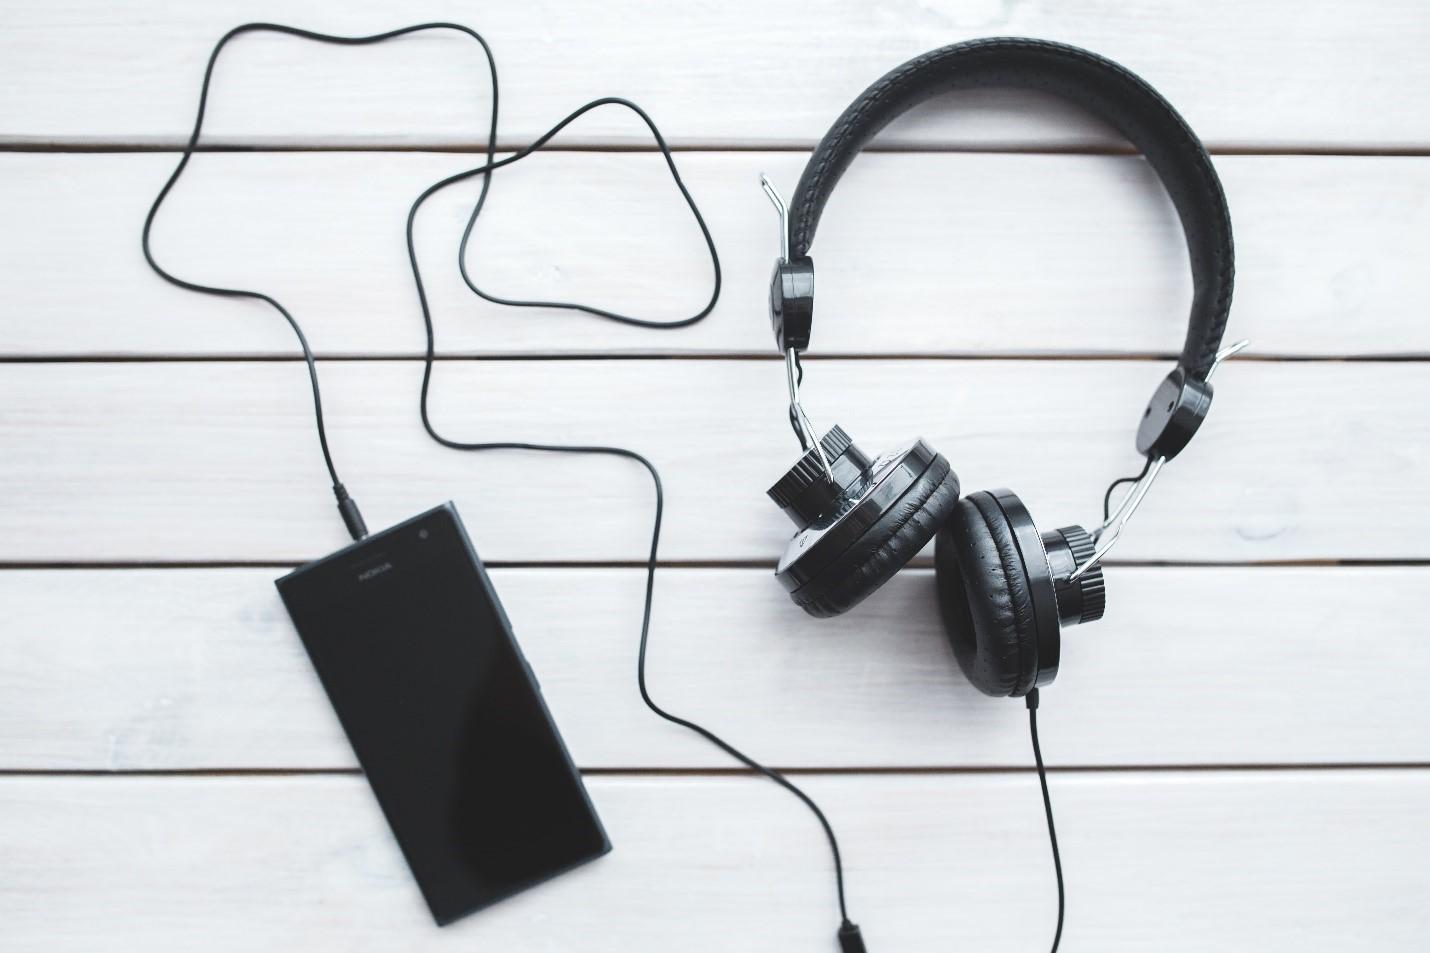 cum să îți vinzi muzica online